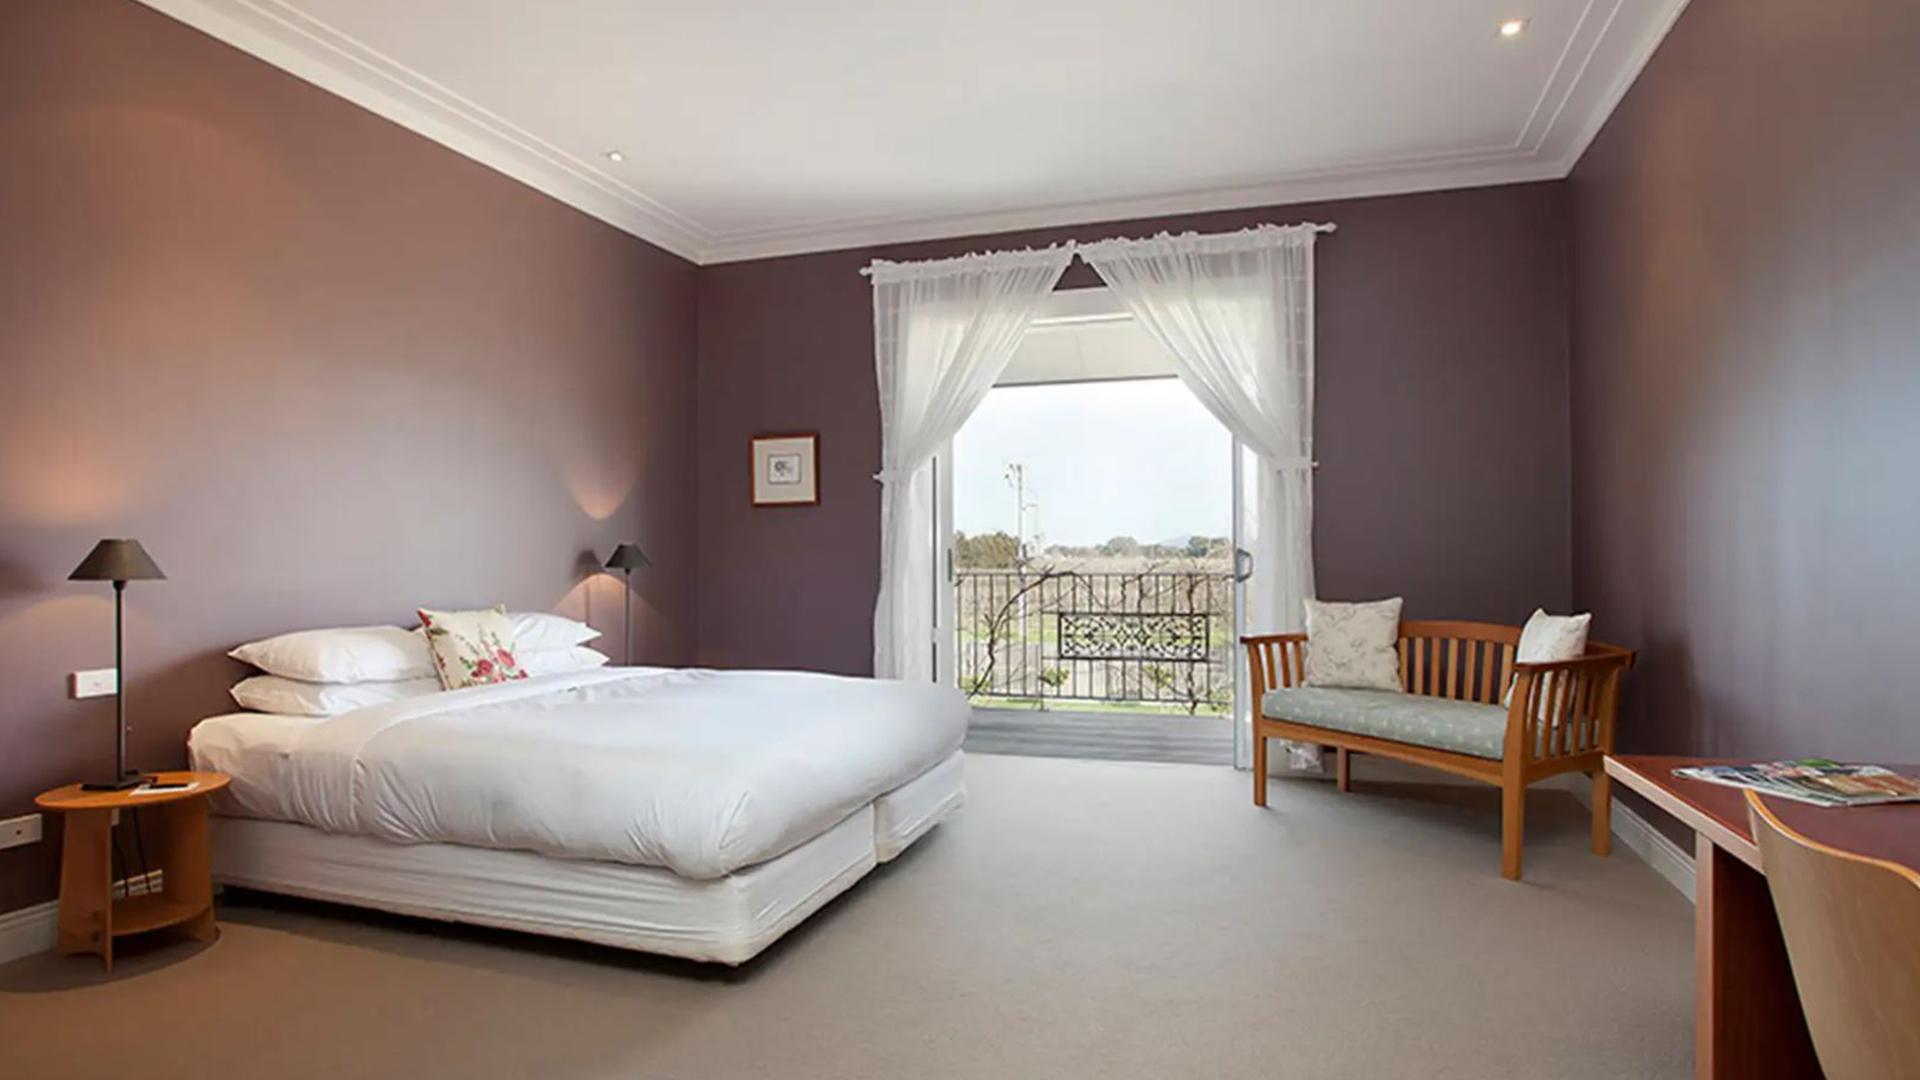 Buffalo Room image 1 at Lancemore Milawa by Wangaratta Rural City, Victoria, Australia